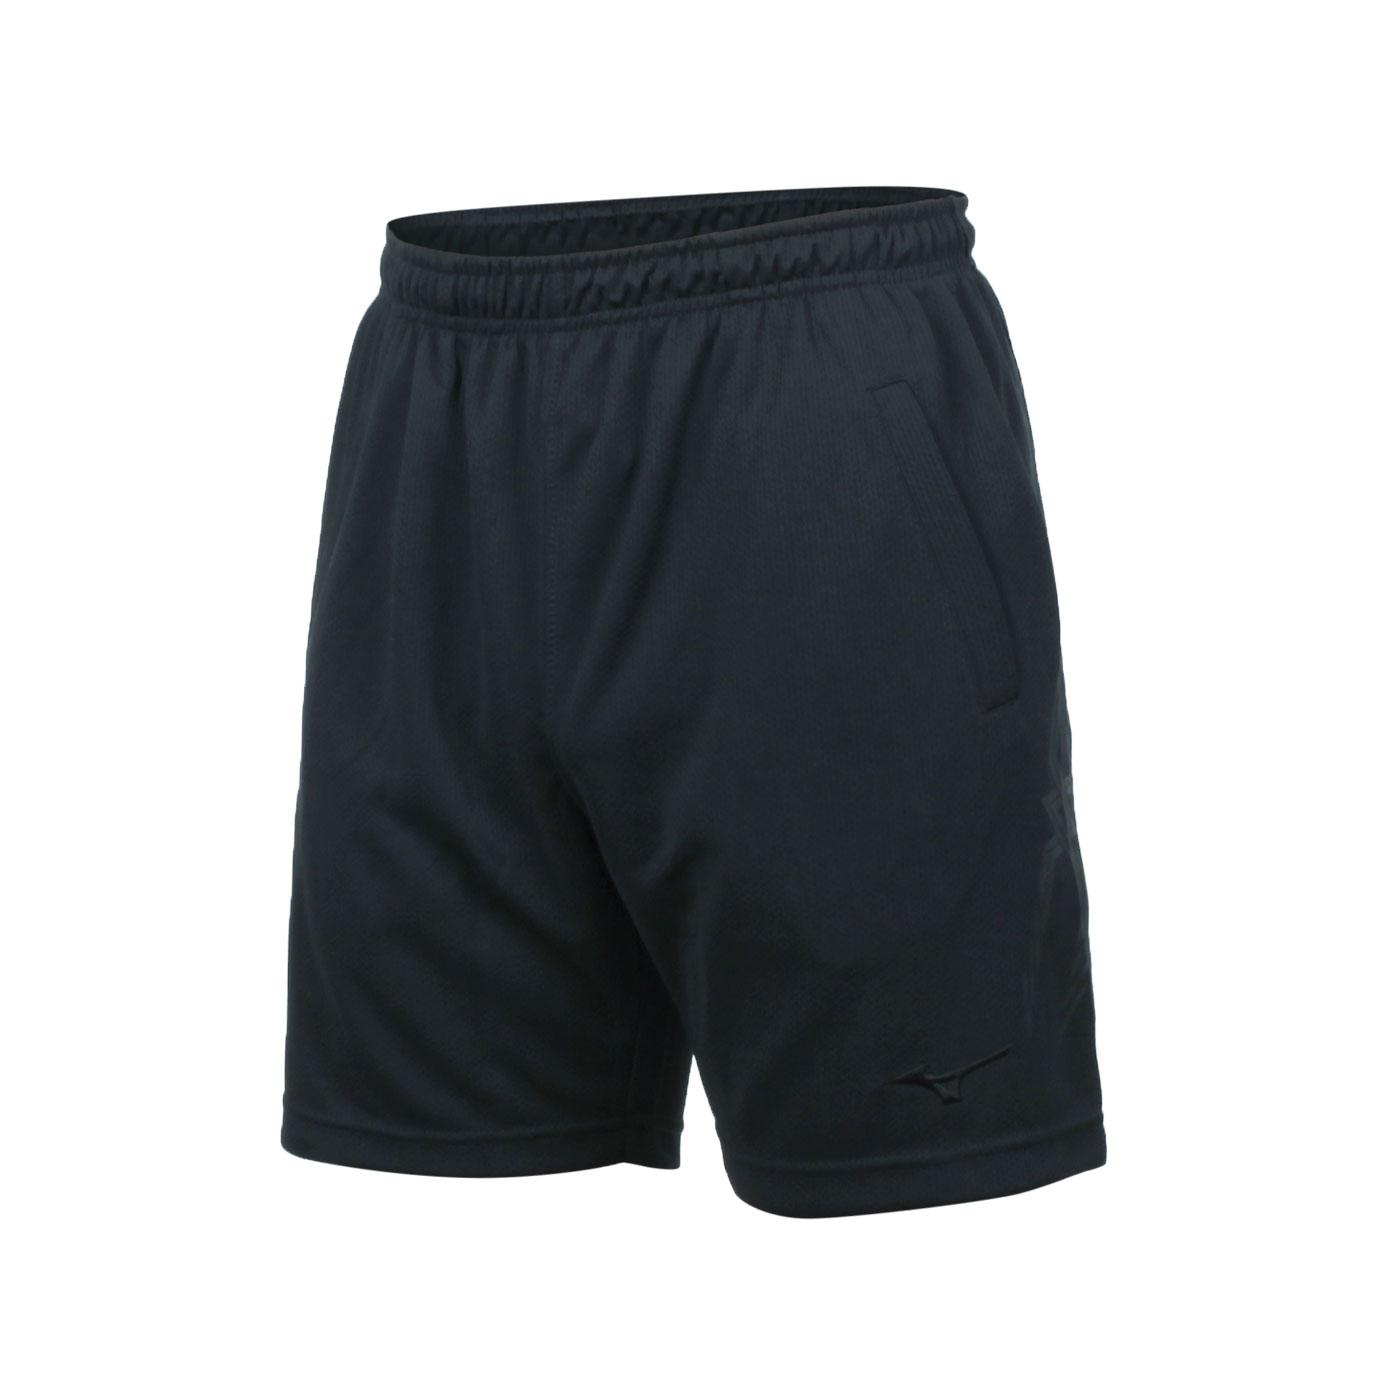 MIZUNO 排球褲 V2TB1A0699A - 黑